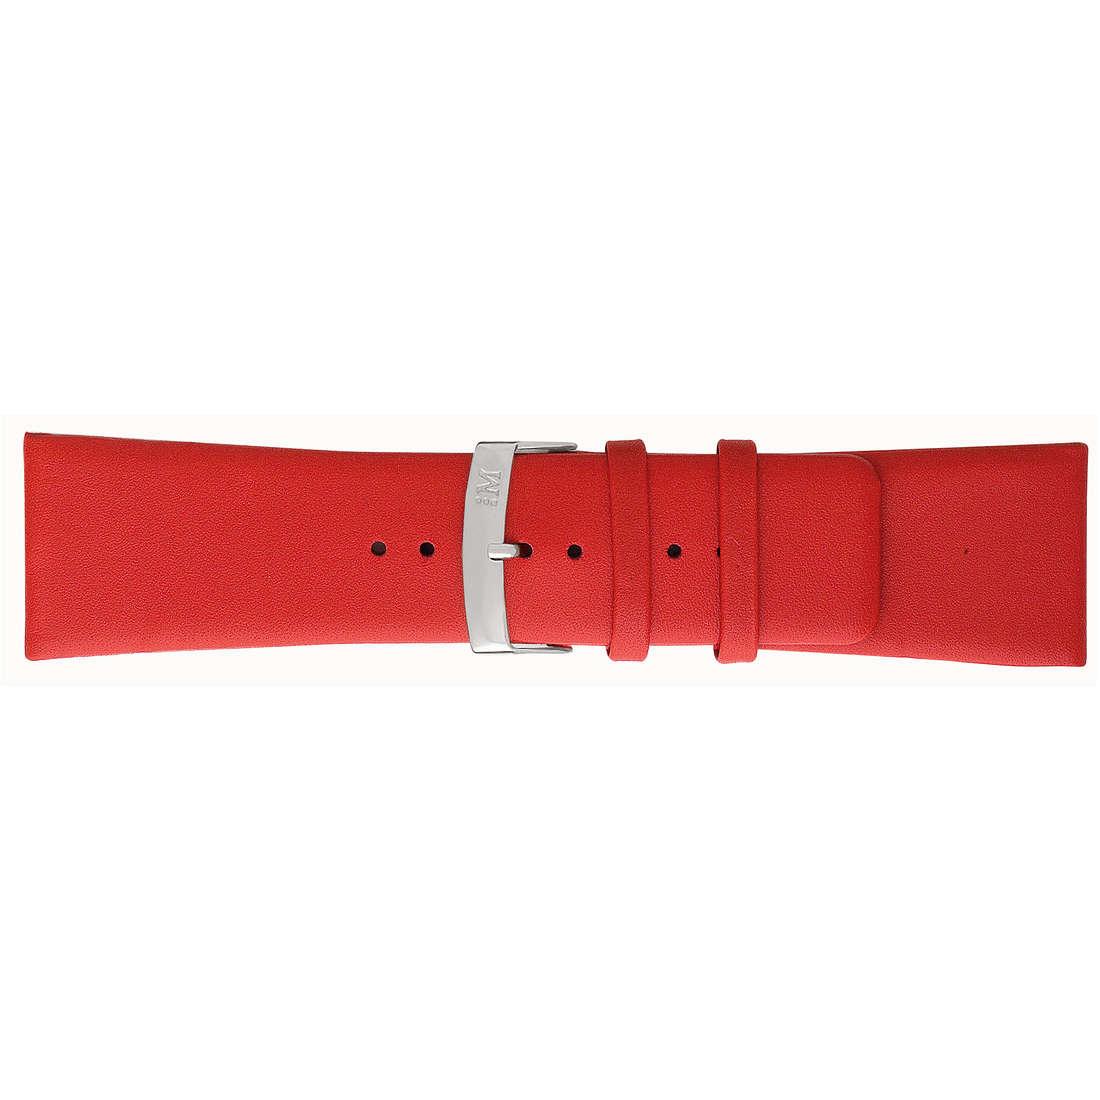 watch watch bands watch straps man Morellato Morellato 1930 A01X3076875083CR22